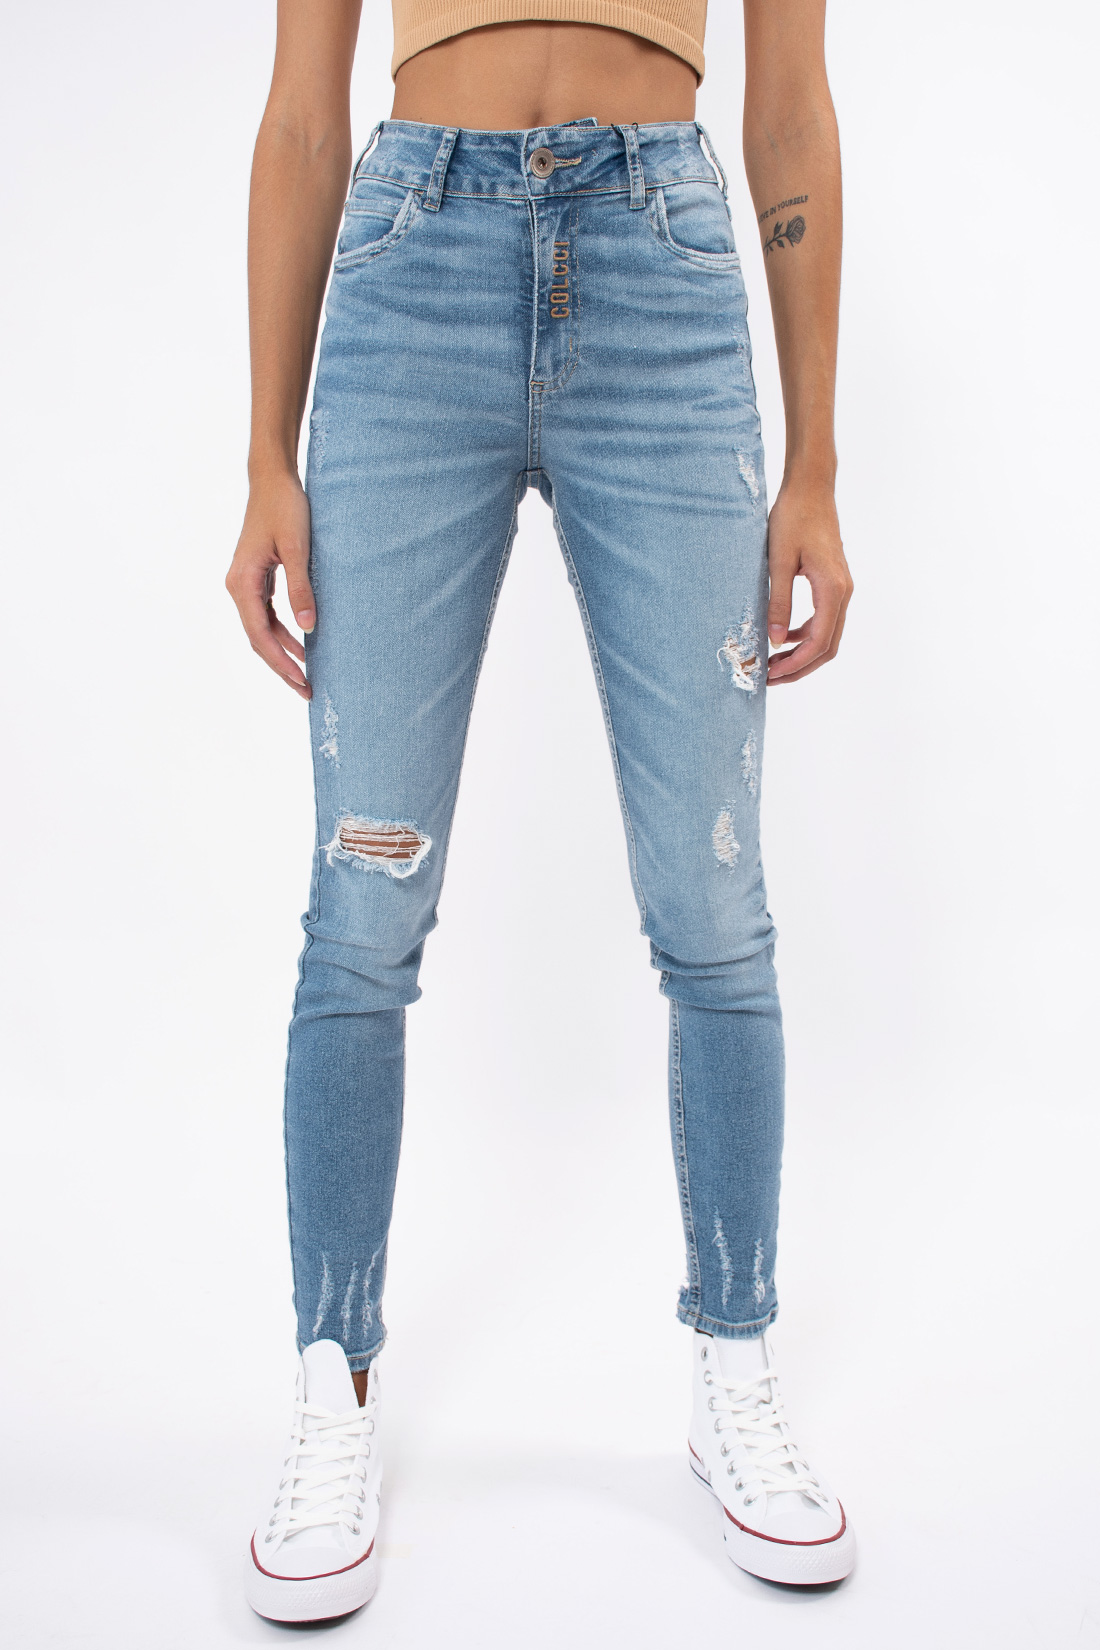 Calca Jeans Colcci Bia Puidos